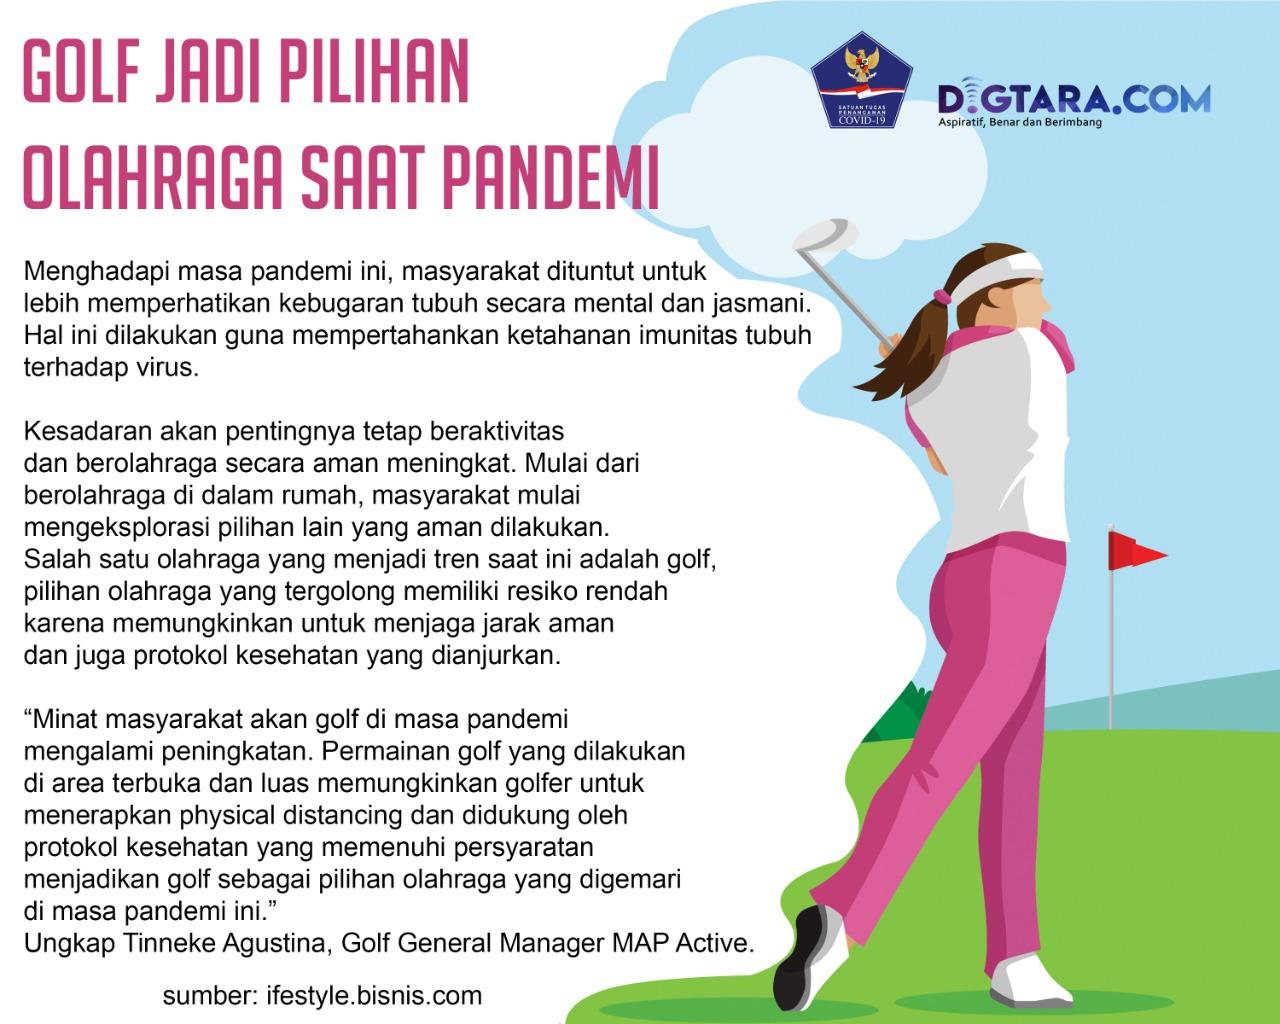 Infografis: Golf Jadi Pilihan Olahraga saat Pandemi